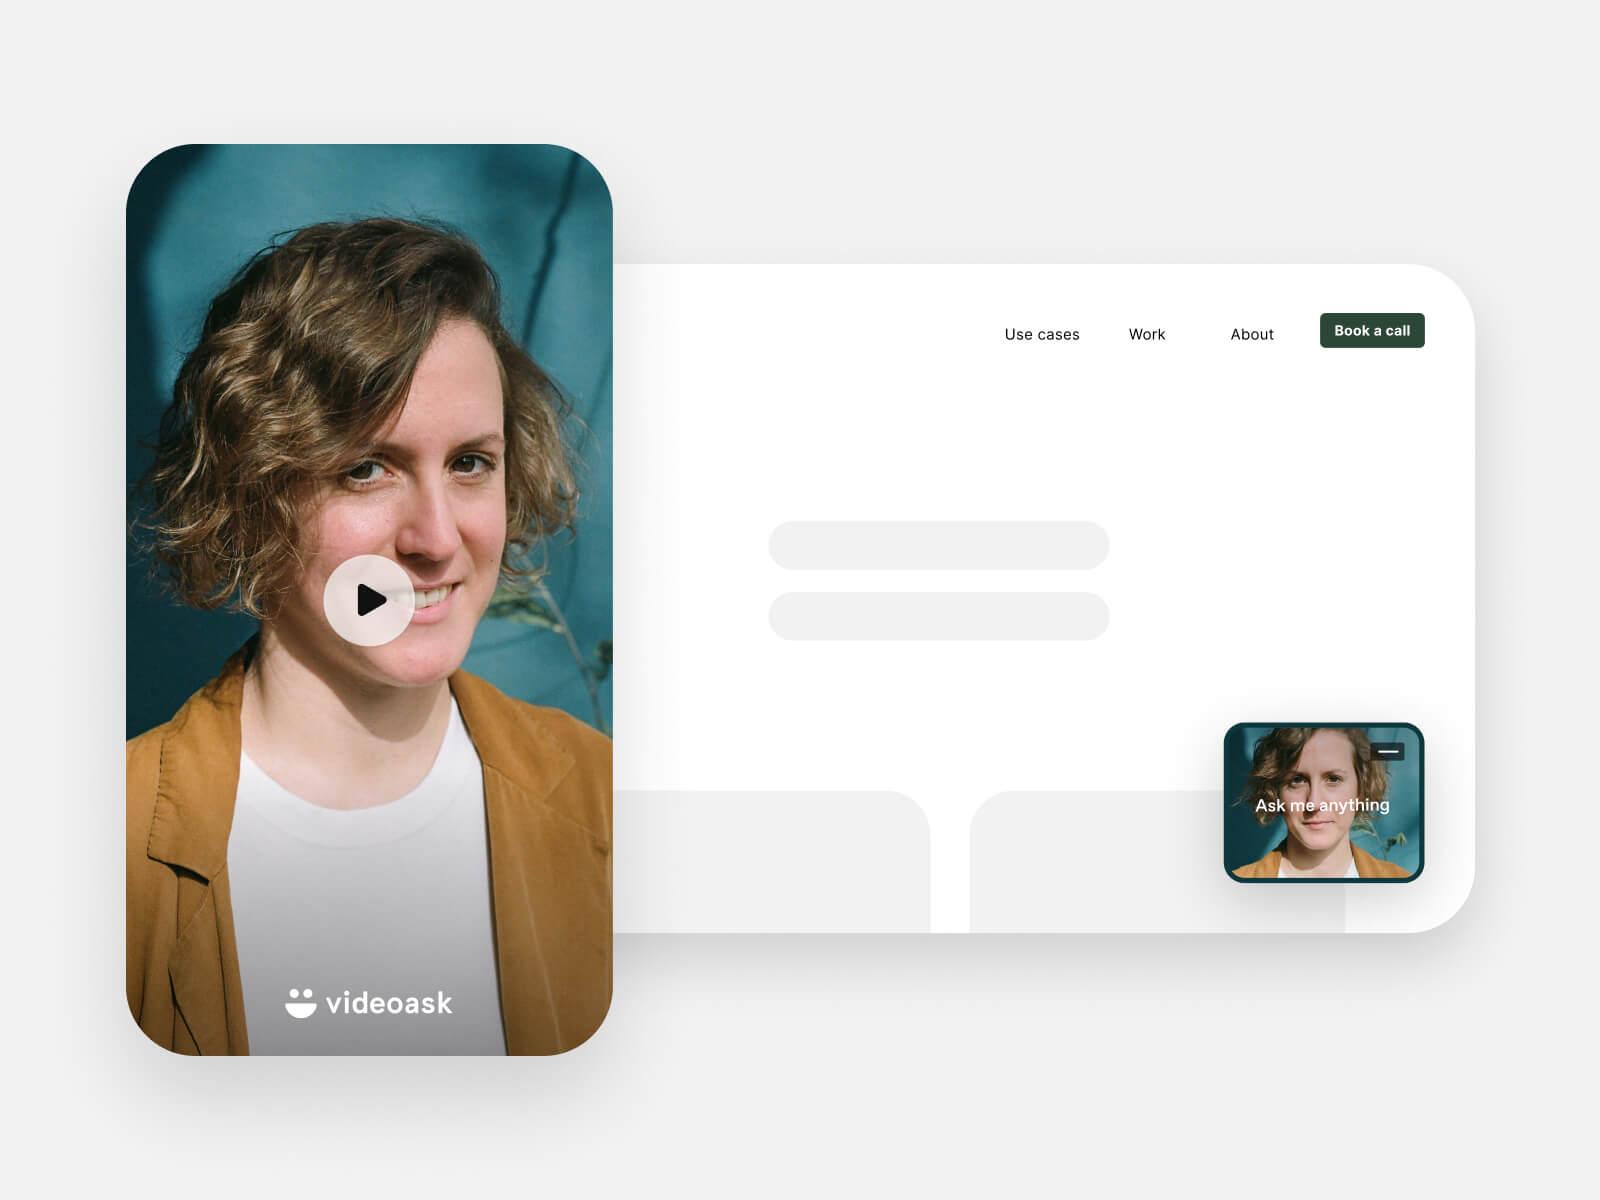 VideoAsk user interface